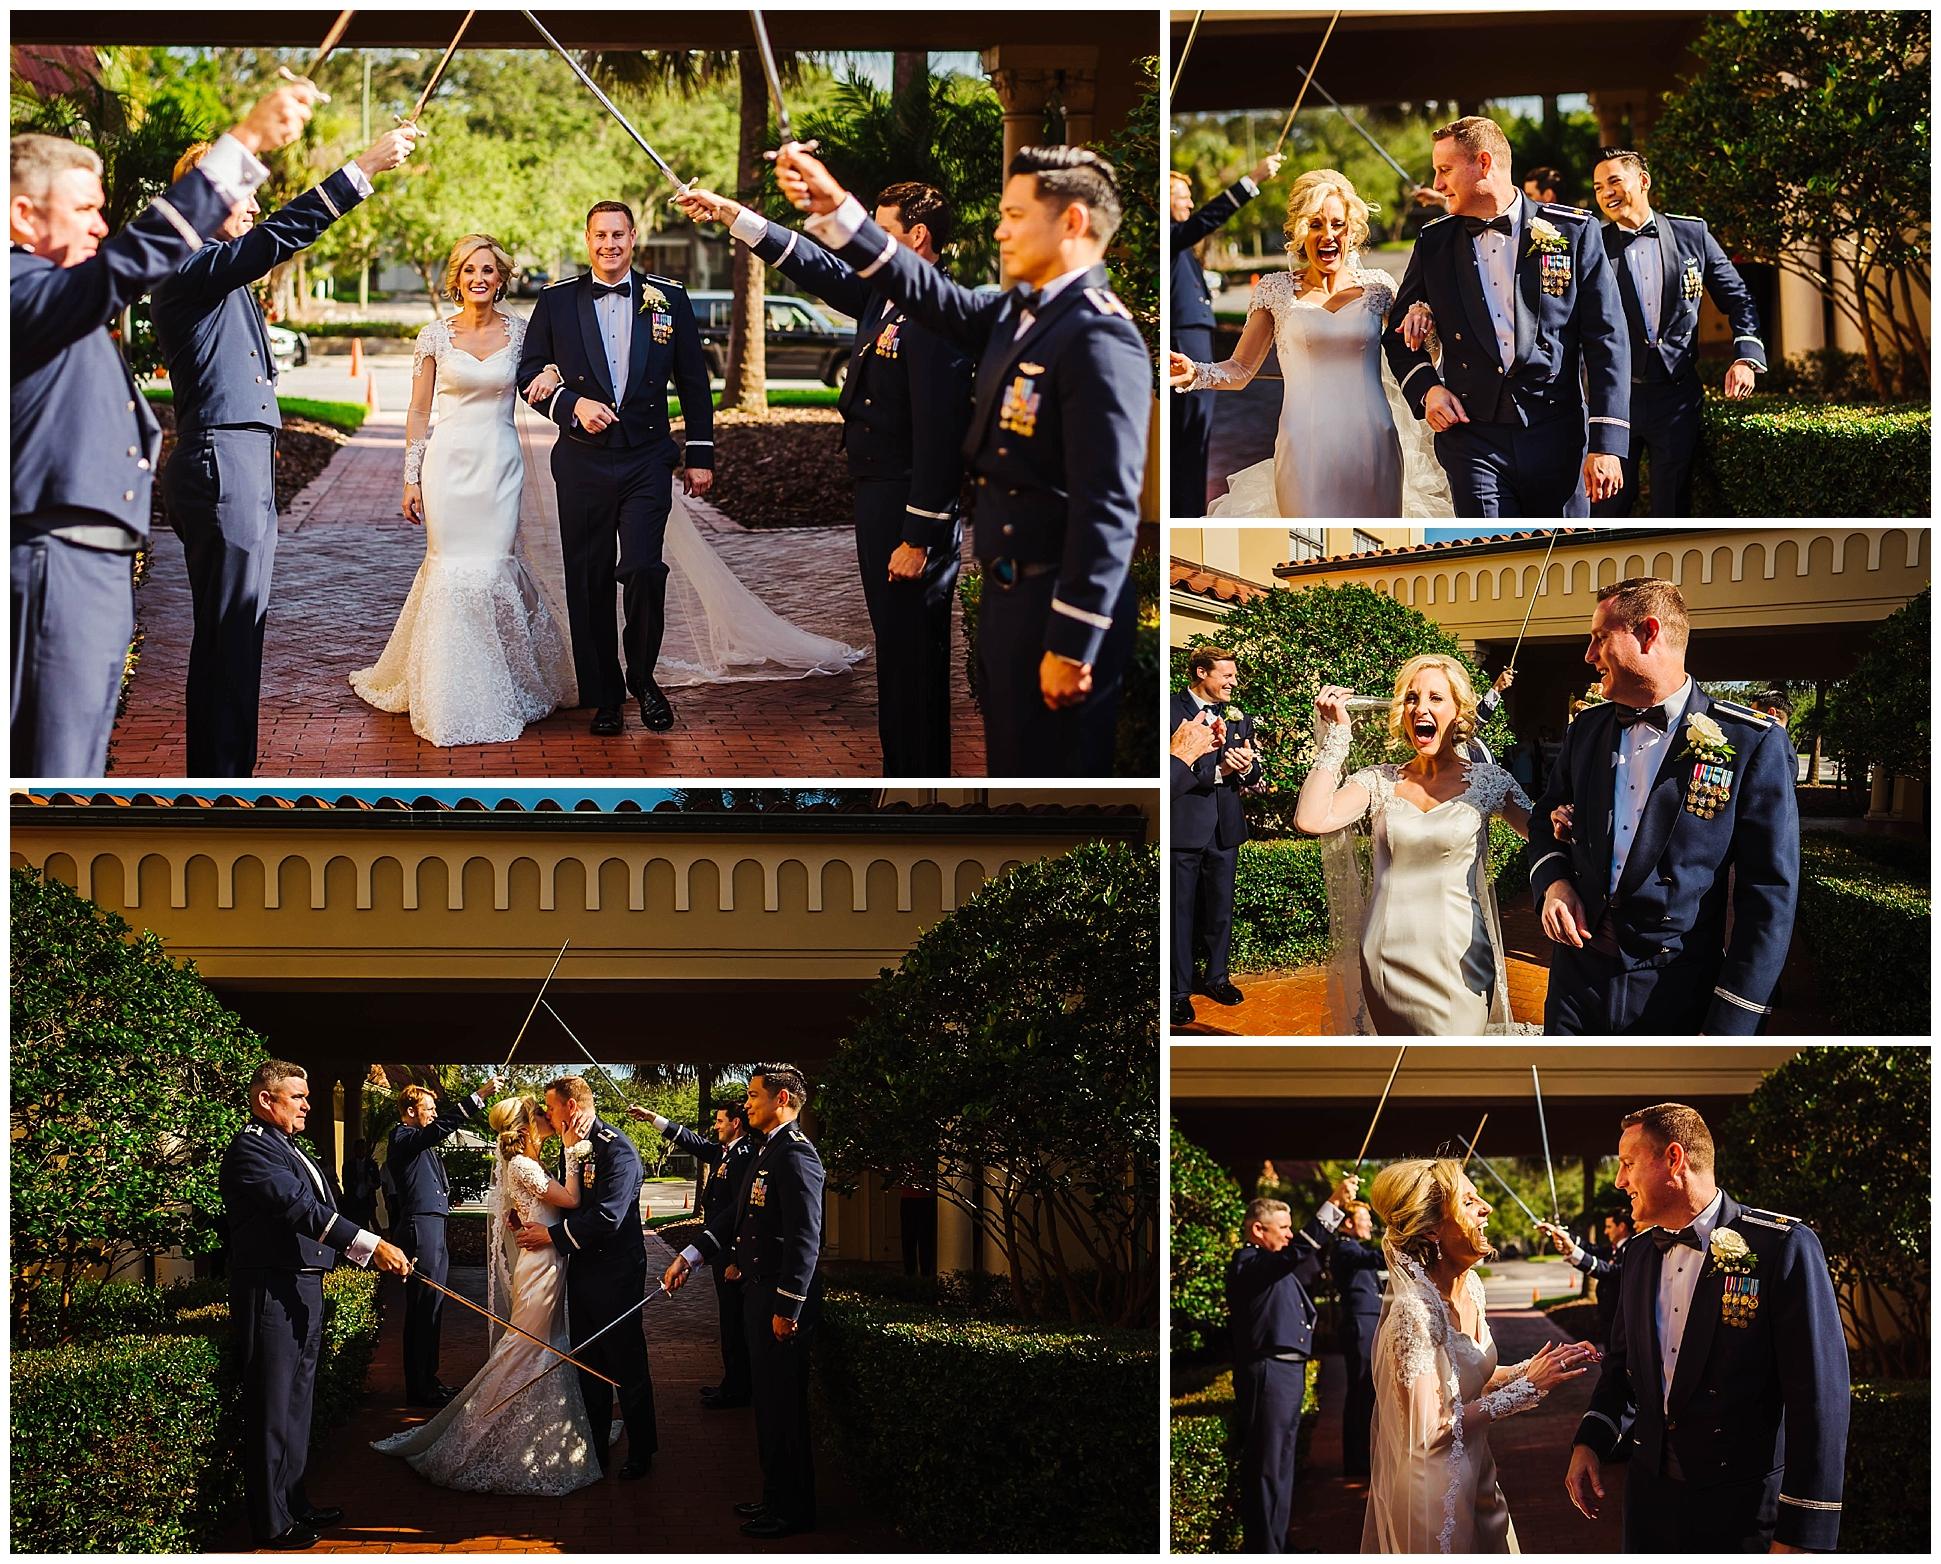 tampa-wedding-photographer-sleeves-palma-ceia-country-club-golf-course-sunset-luxury_0051.jpg